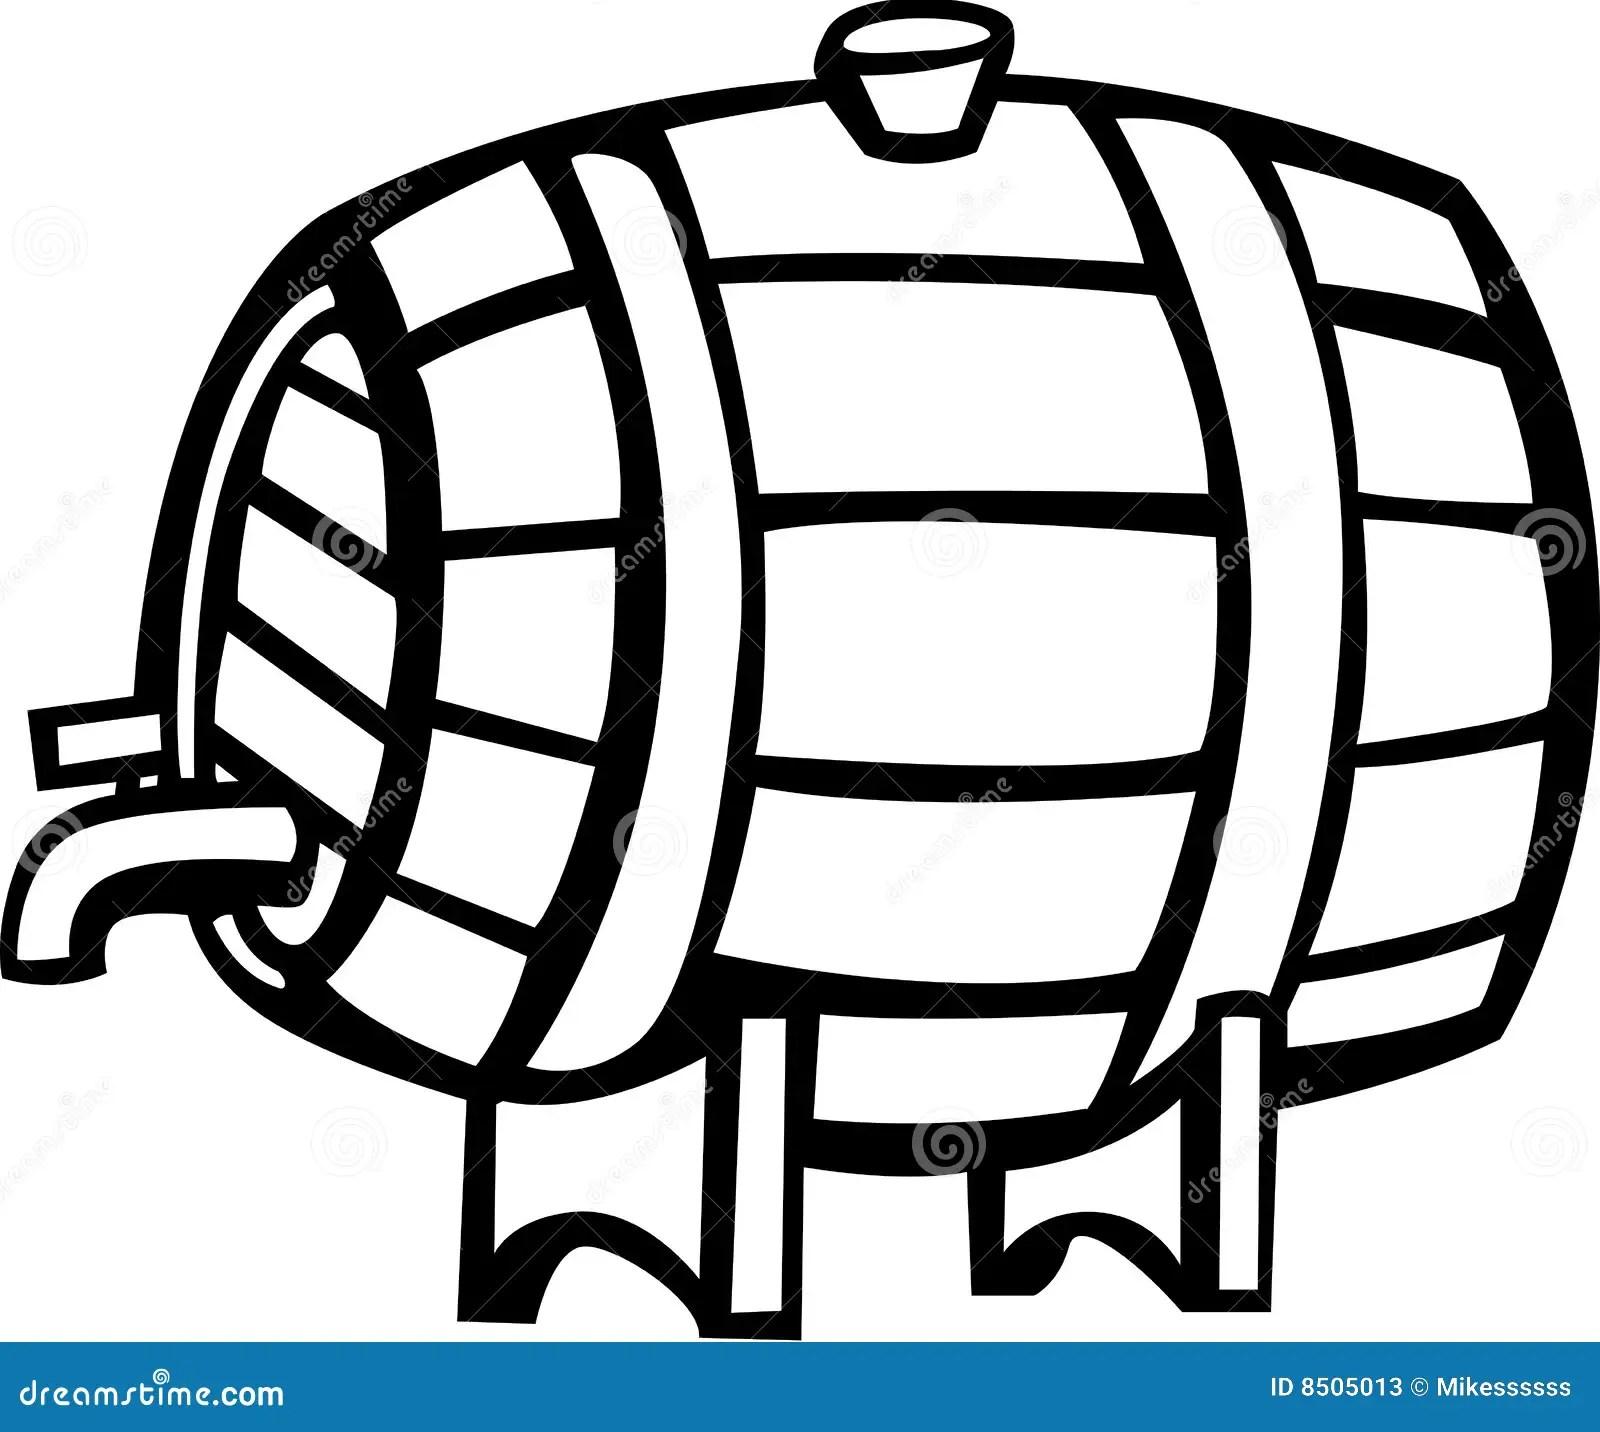 Drink Barrel Vector Illustration Stock Photos